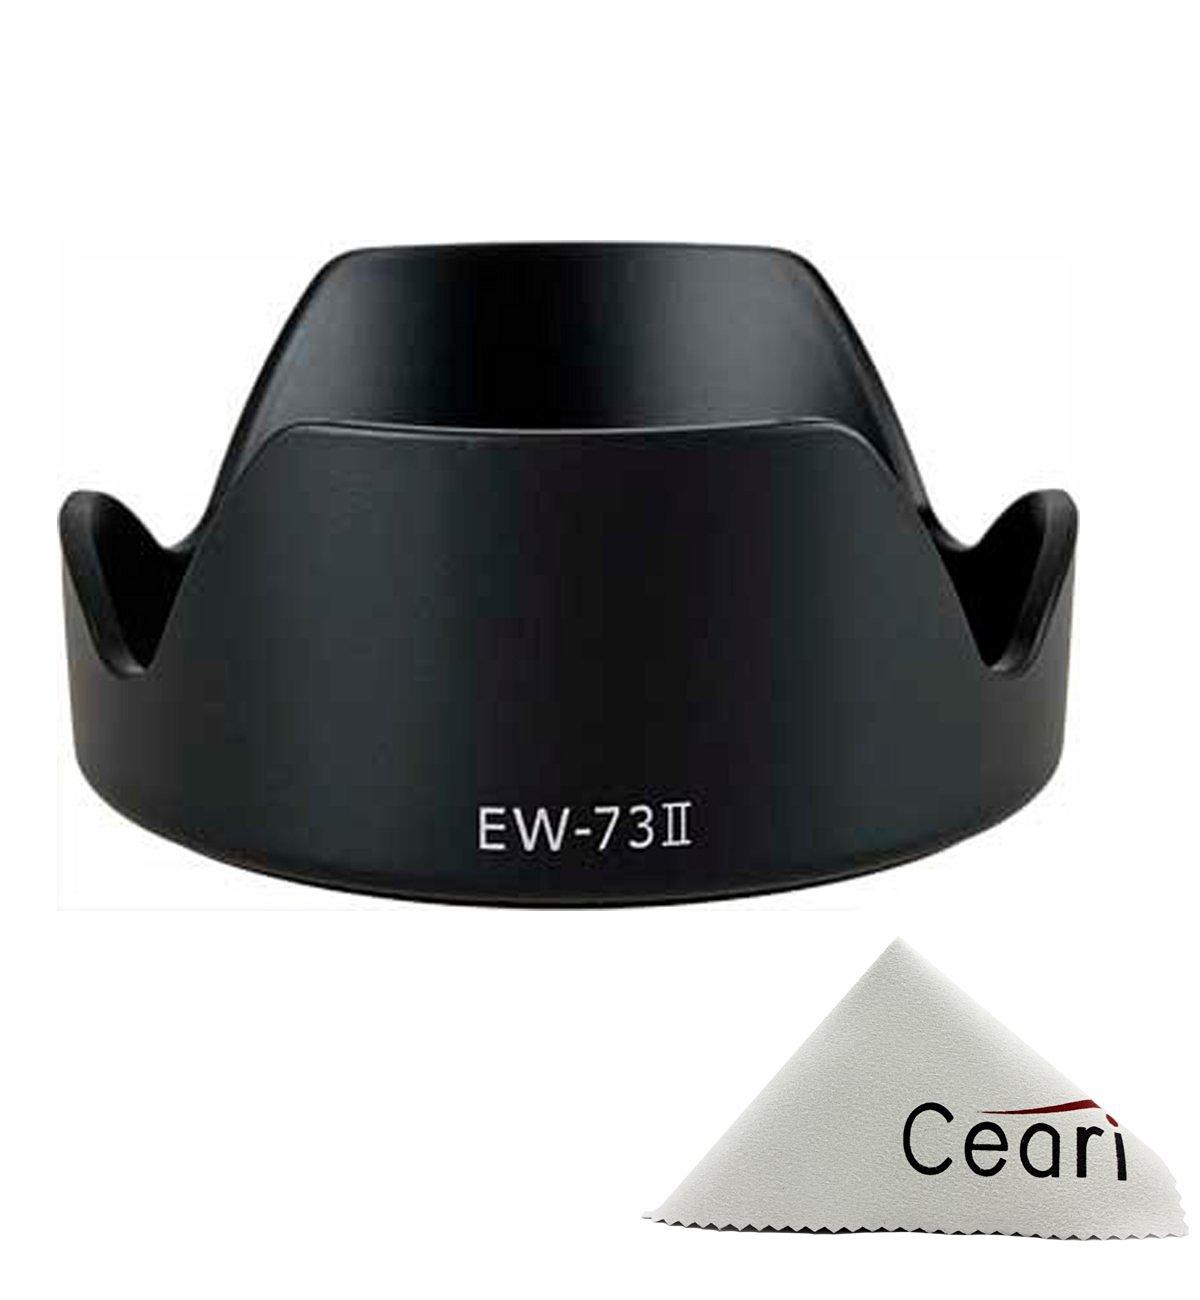 CEARI Dedicated Petal Replacement EW-73 II Bayonet Lens Hood for Canon EF 24-85mm F/3.5-4.5 USM Lens + CEARI MicroFiber Clean Cloth